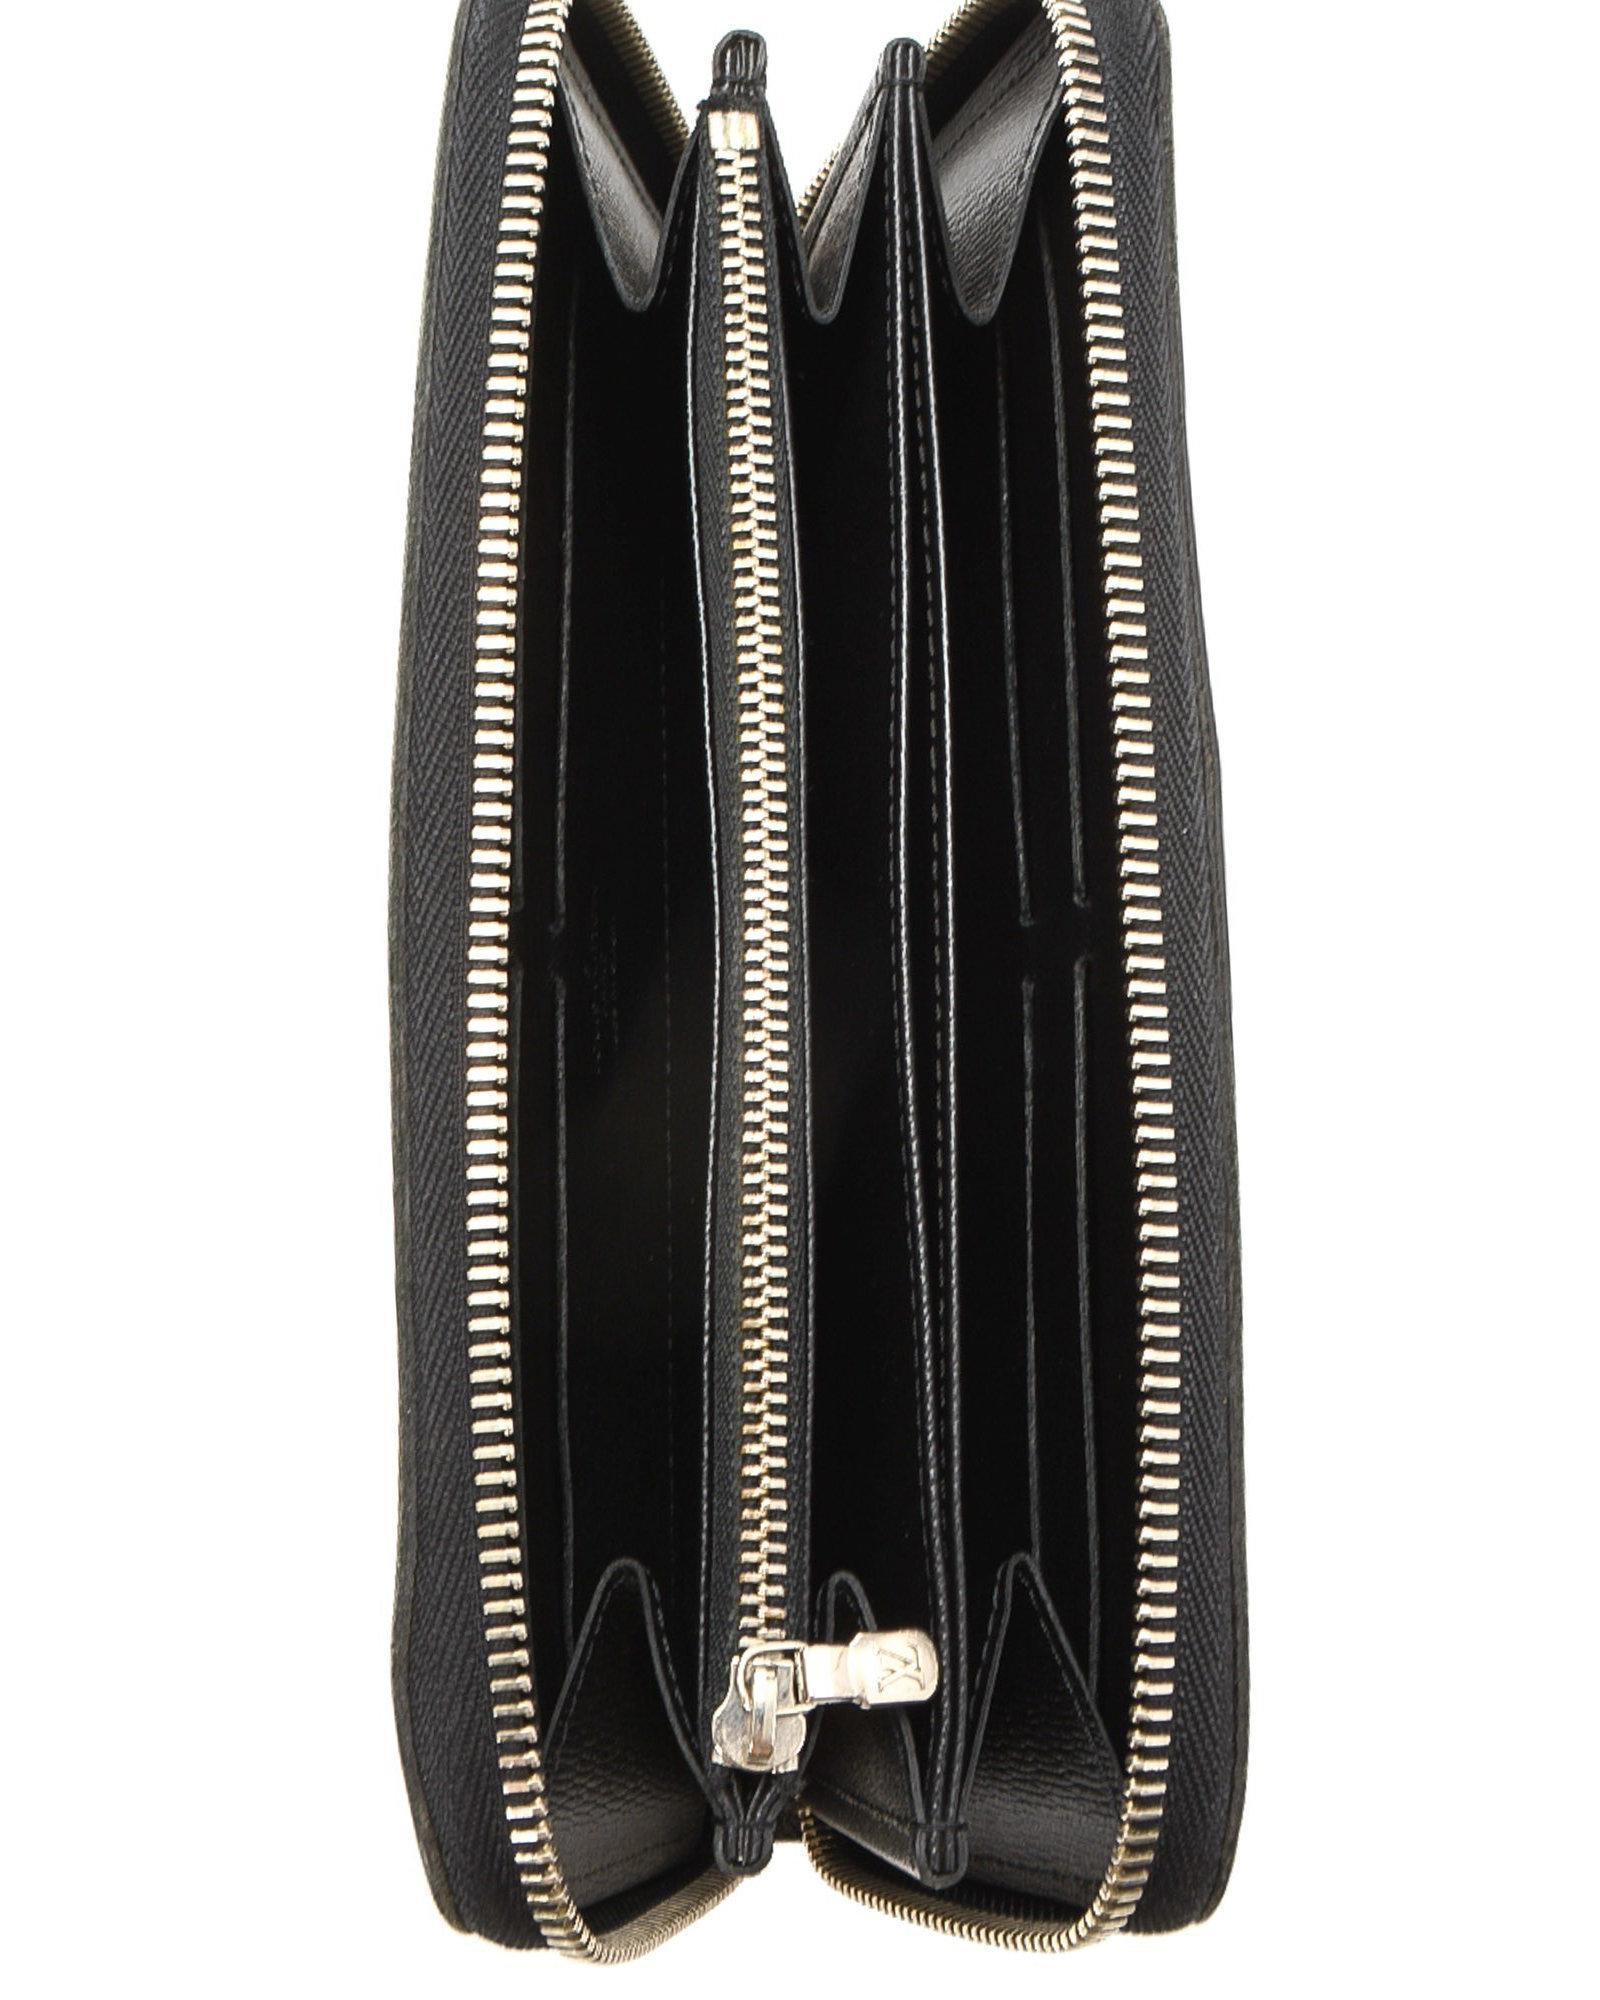 062b11a6b395 Lyst - Louis Vuitton Zippy Wallet - Vintage in Black